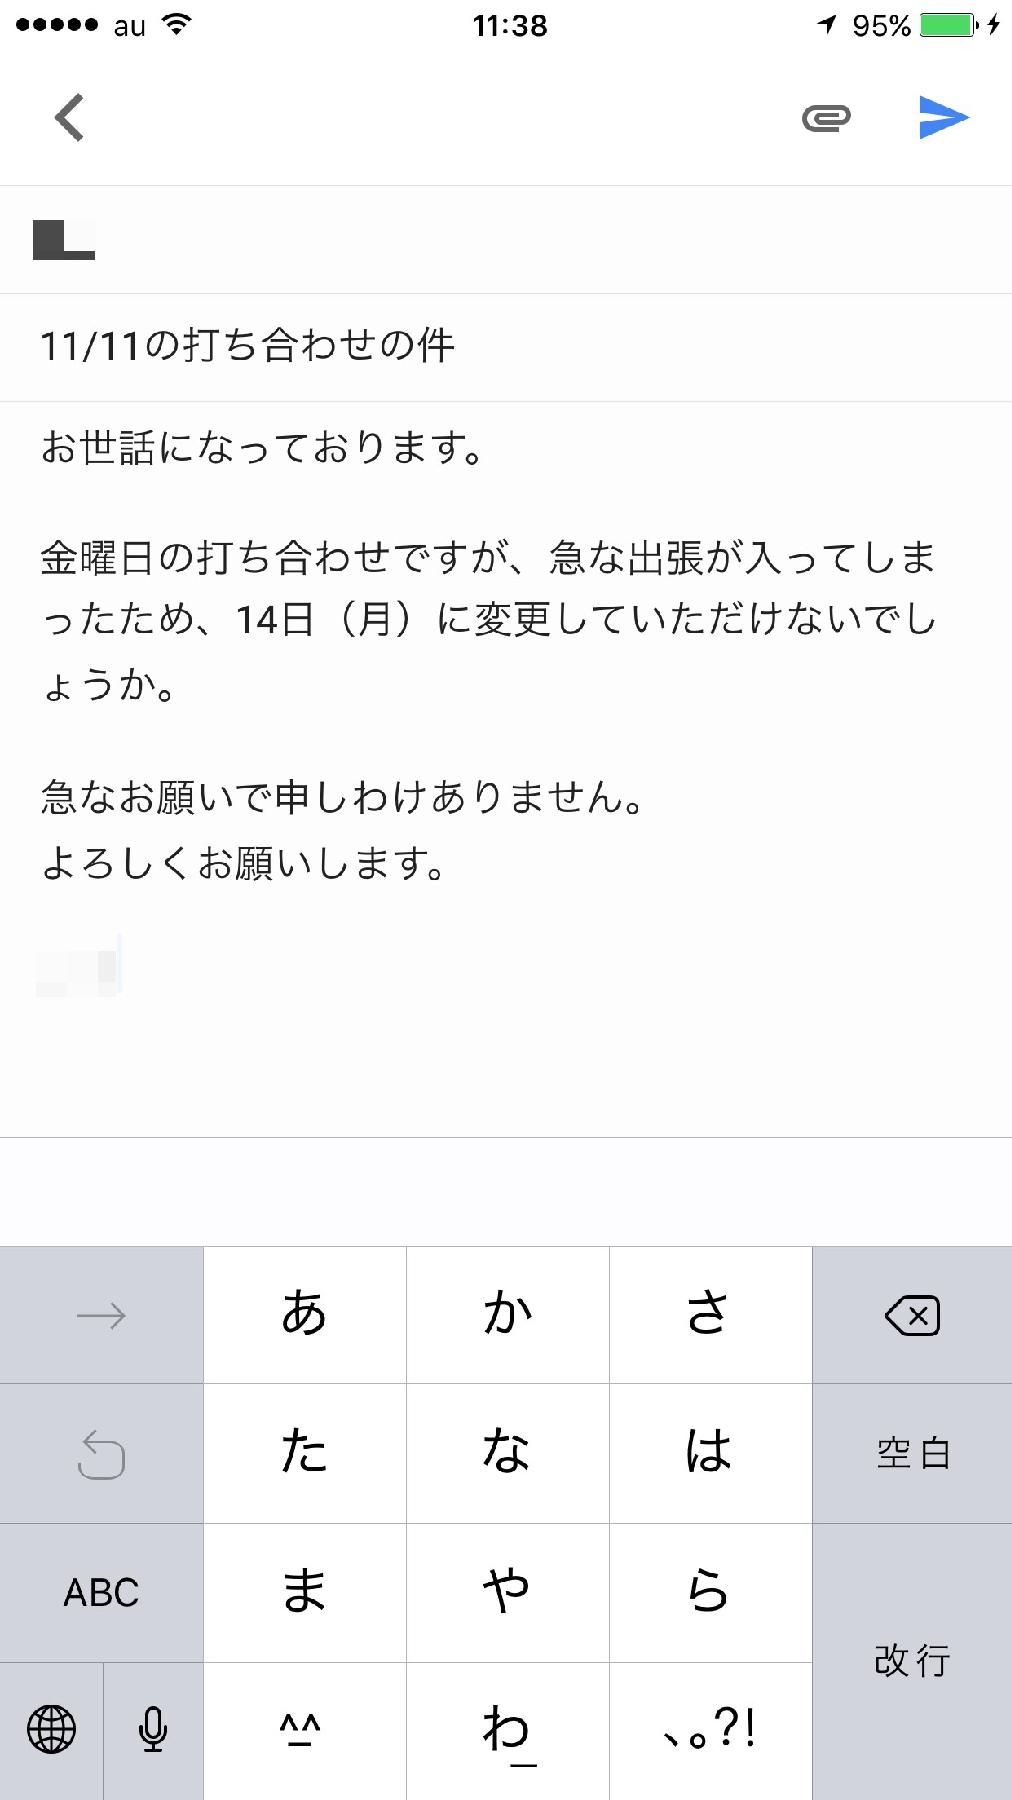 iPhoneの[Gmail]アプリのメール作成画面その2